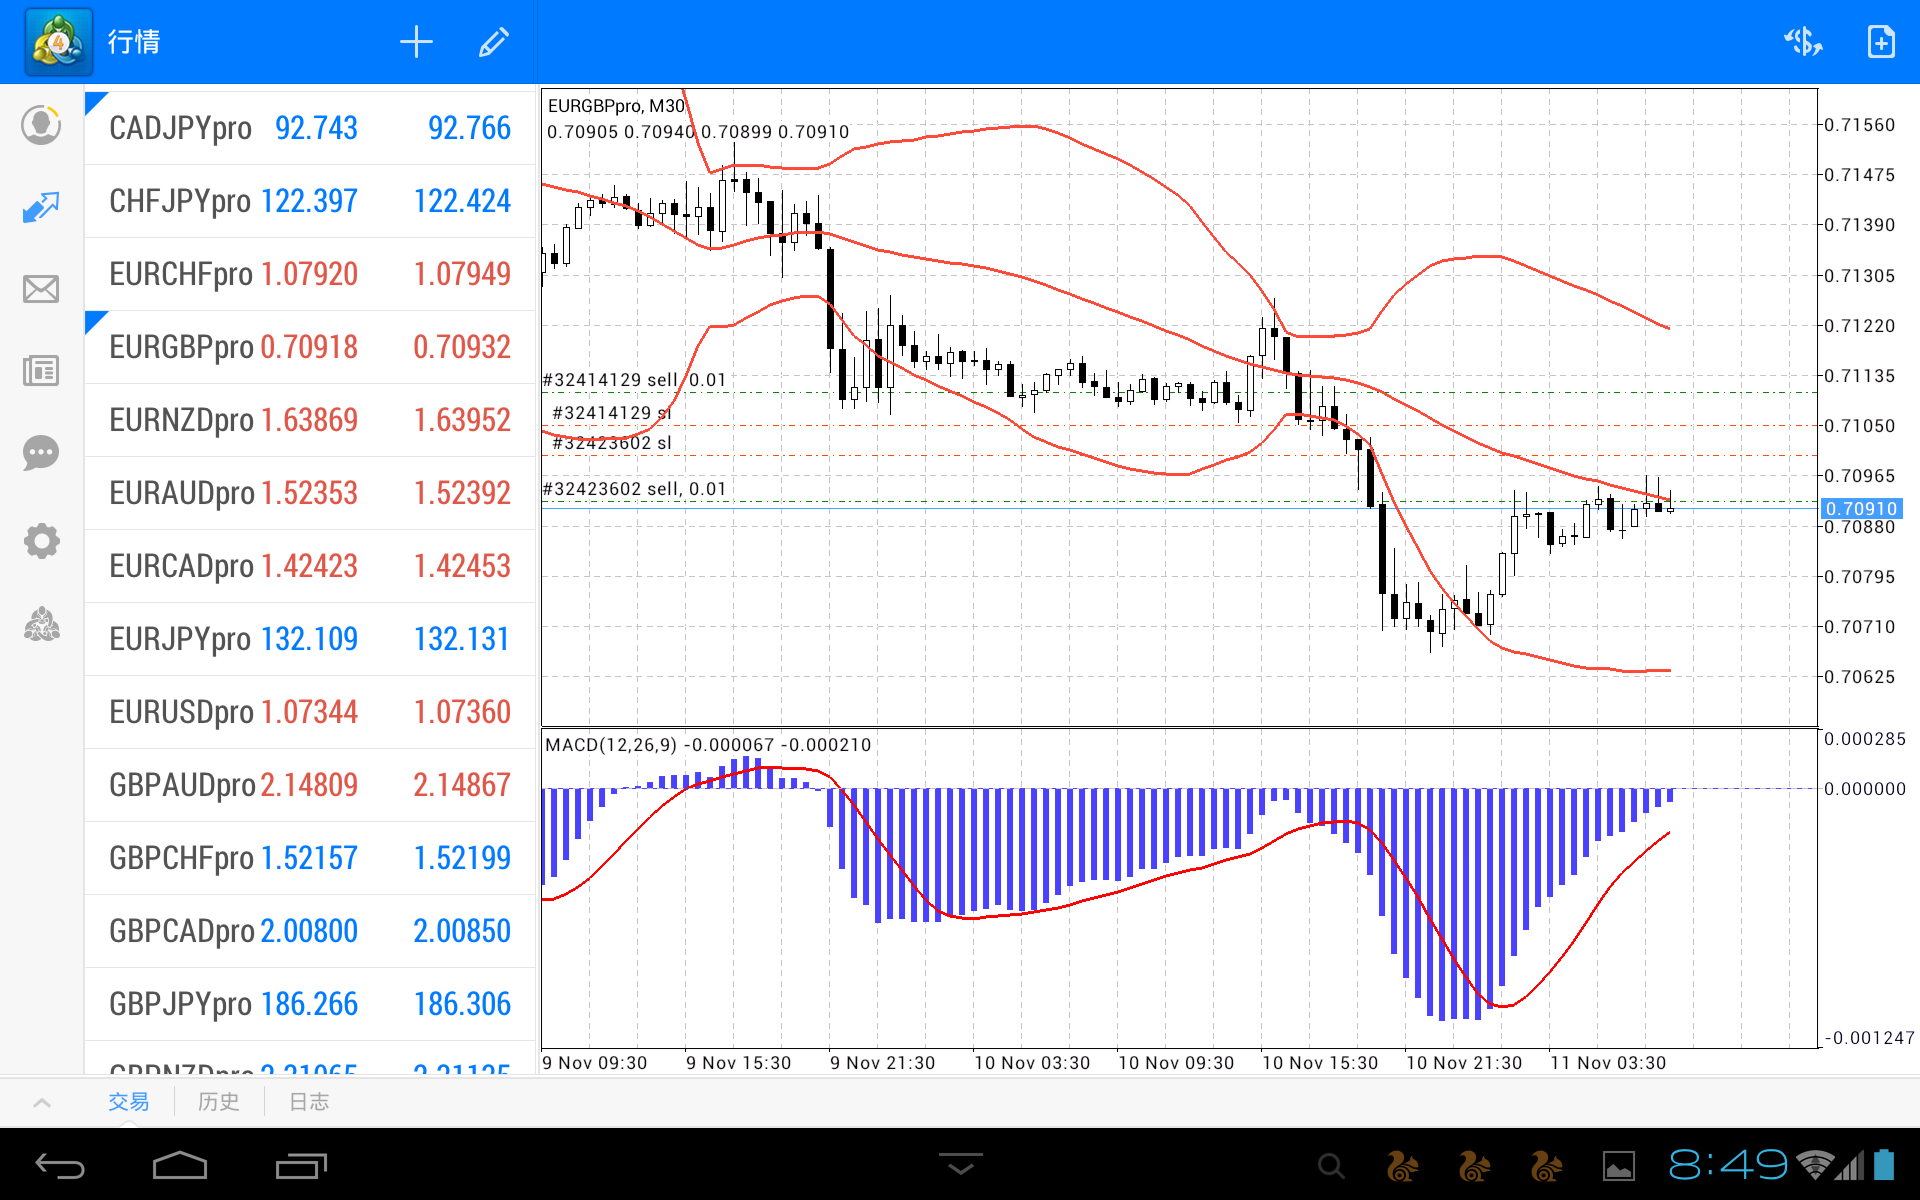 Crest trading system